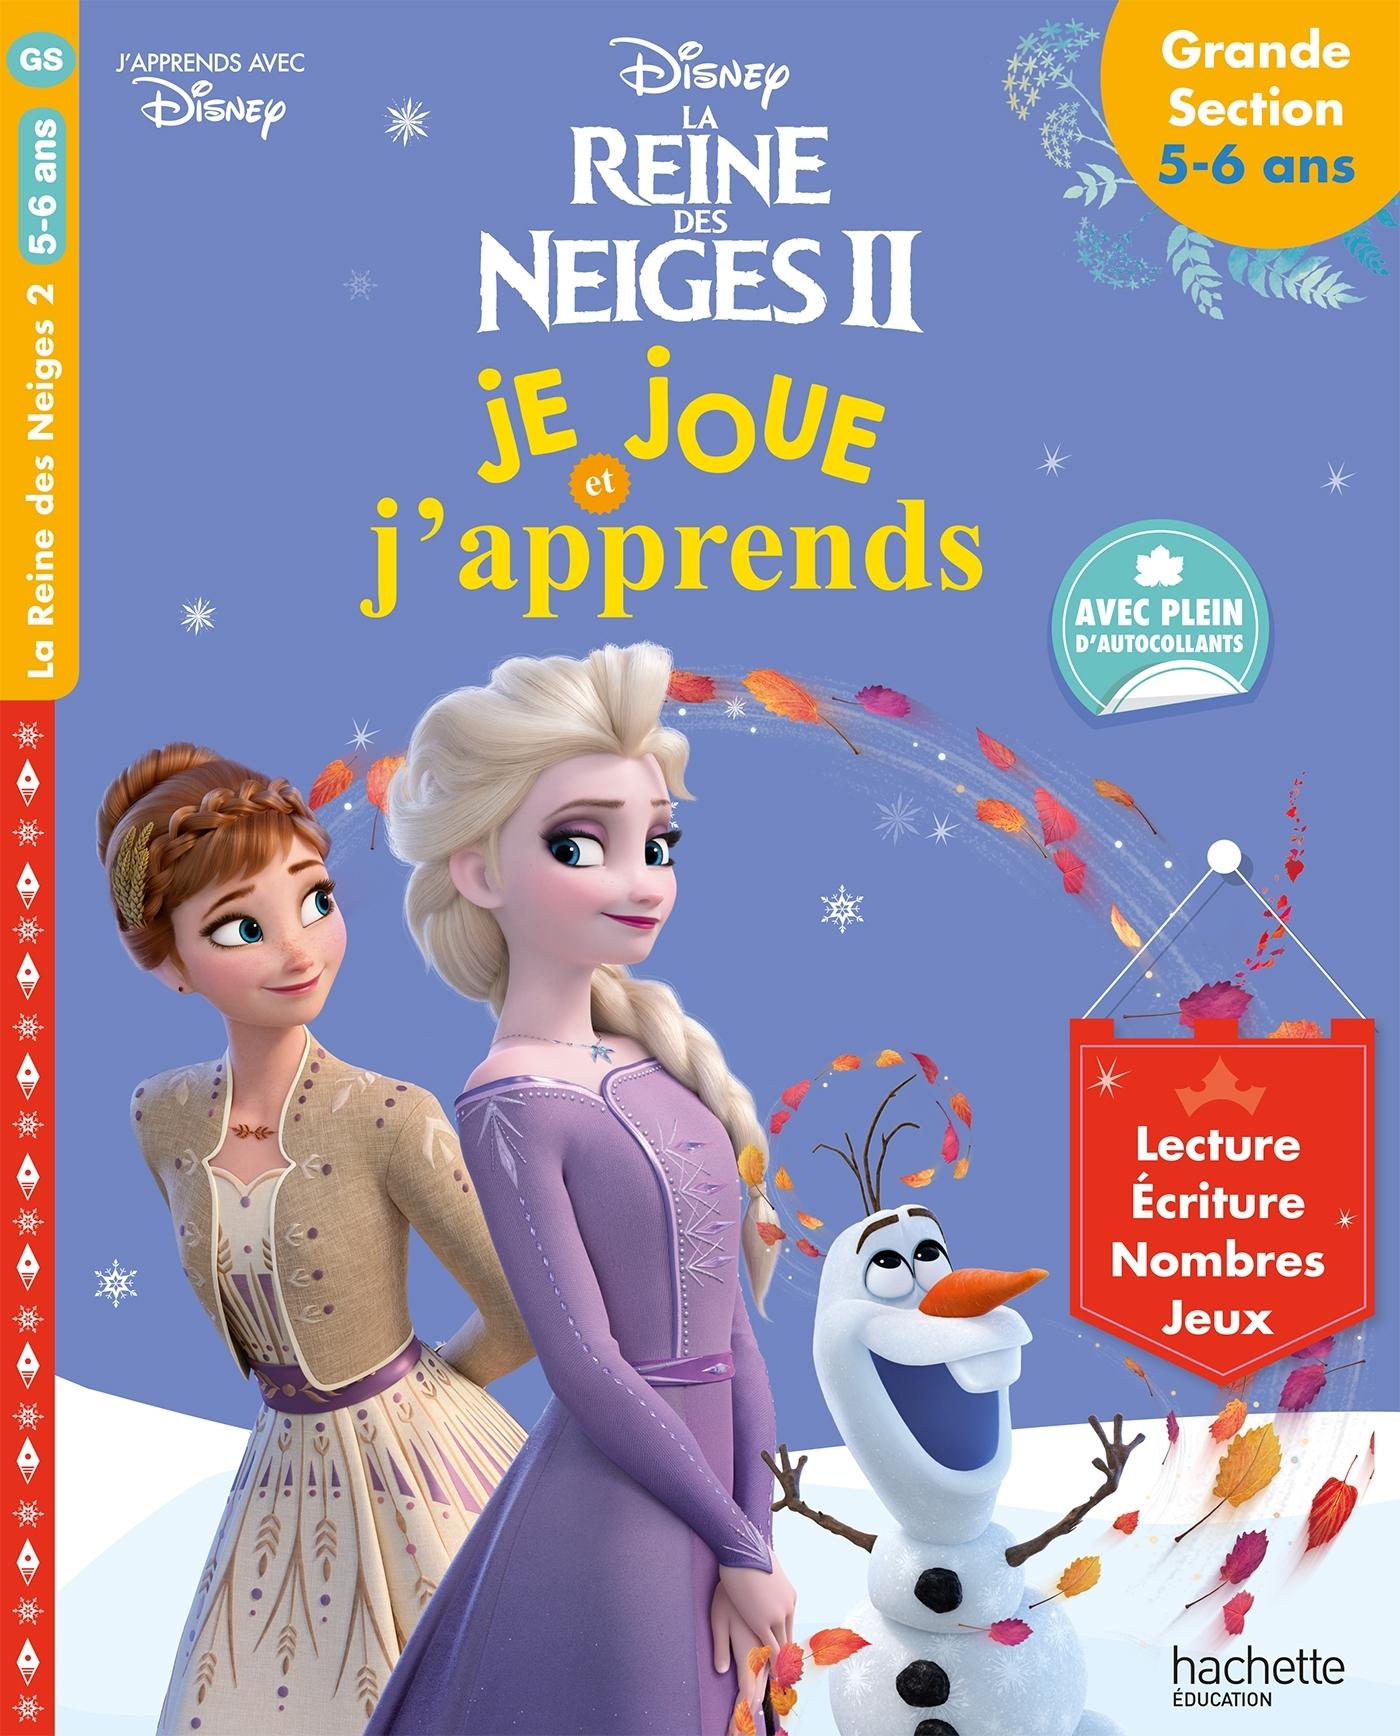 REINE DES NEIGES 2 - JE JOUE ET J'APPRENDS GRANDE SECTION (5 - 6 ANS)